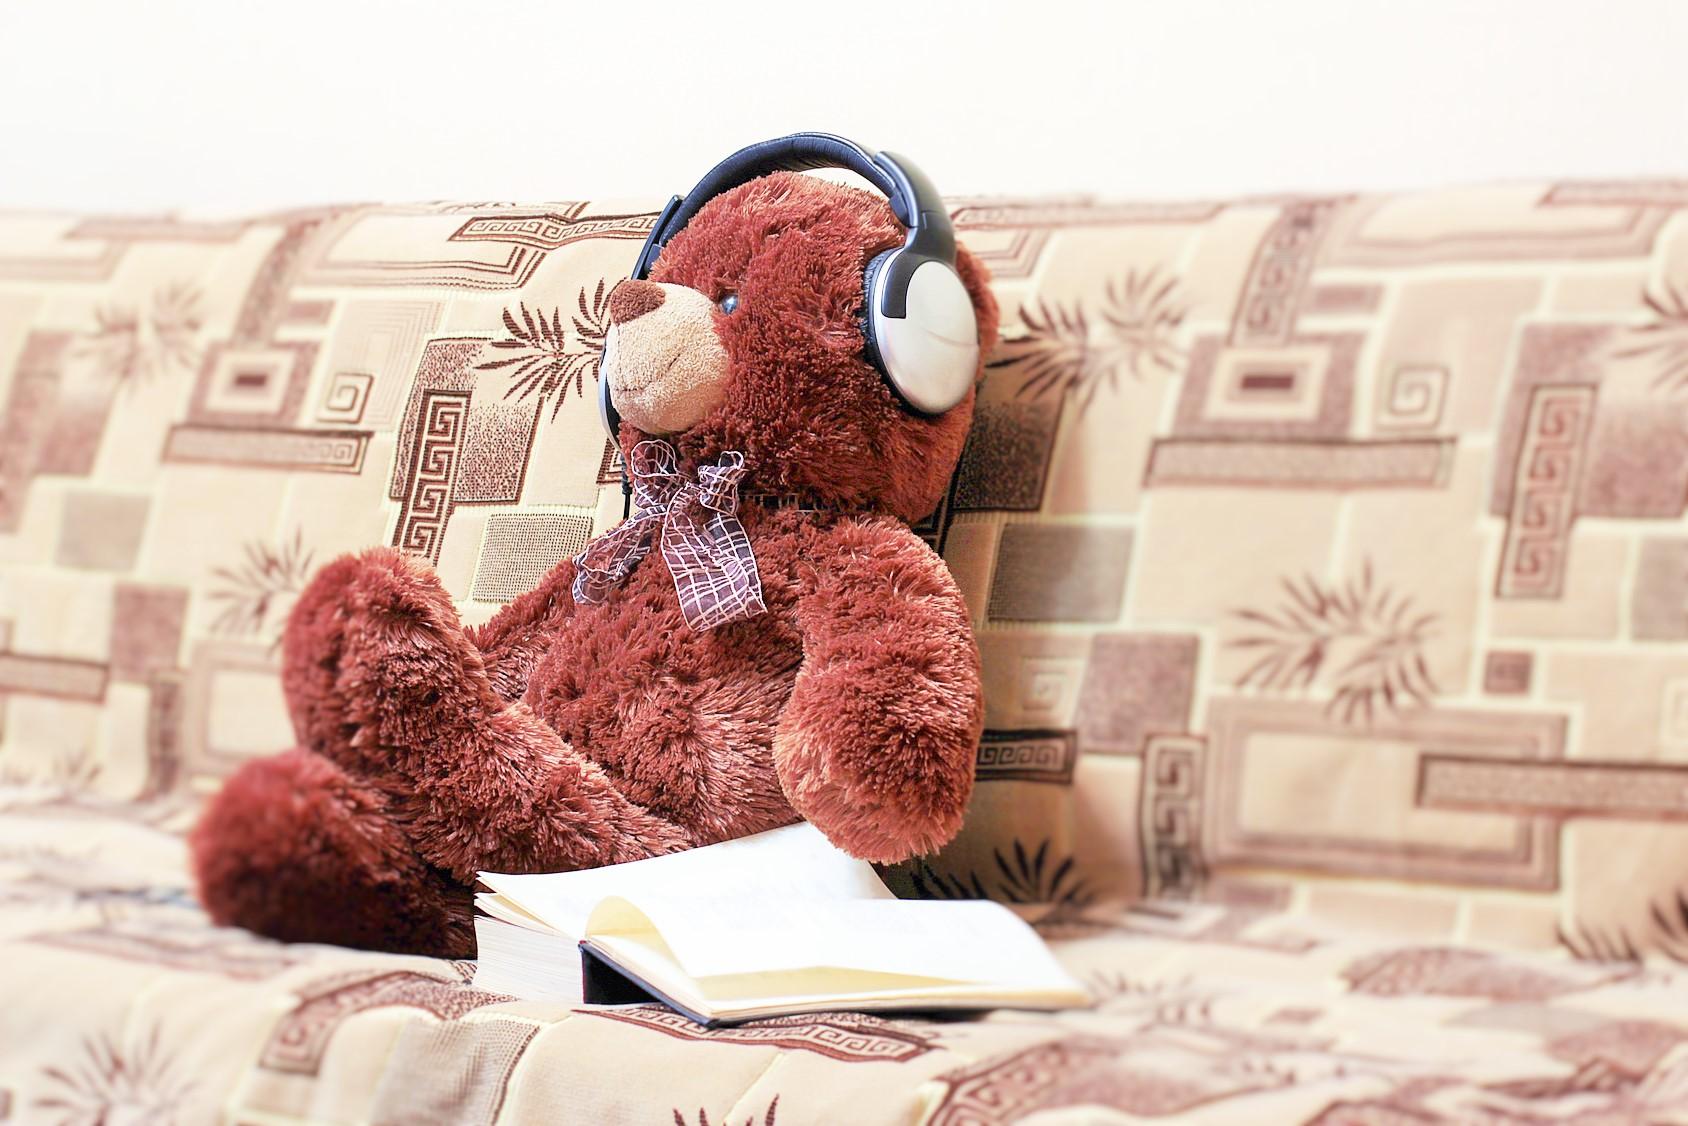 Bear, headphones, book